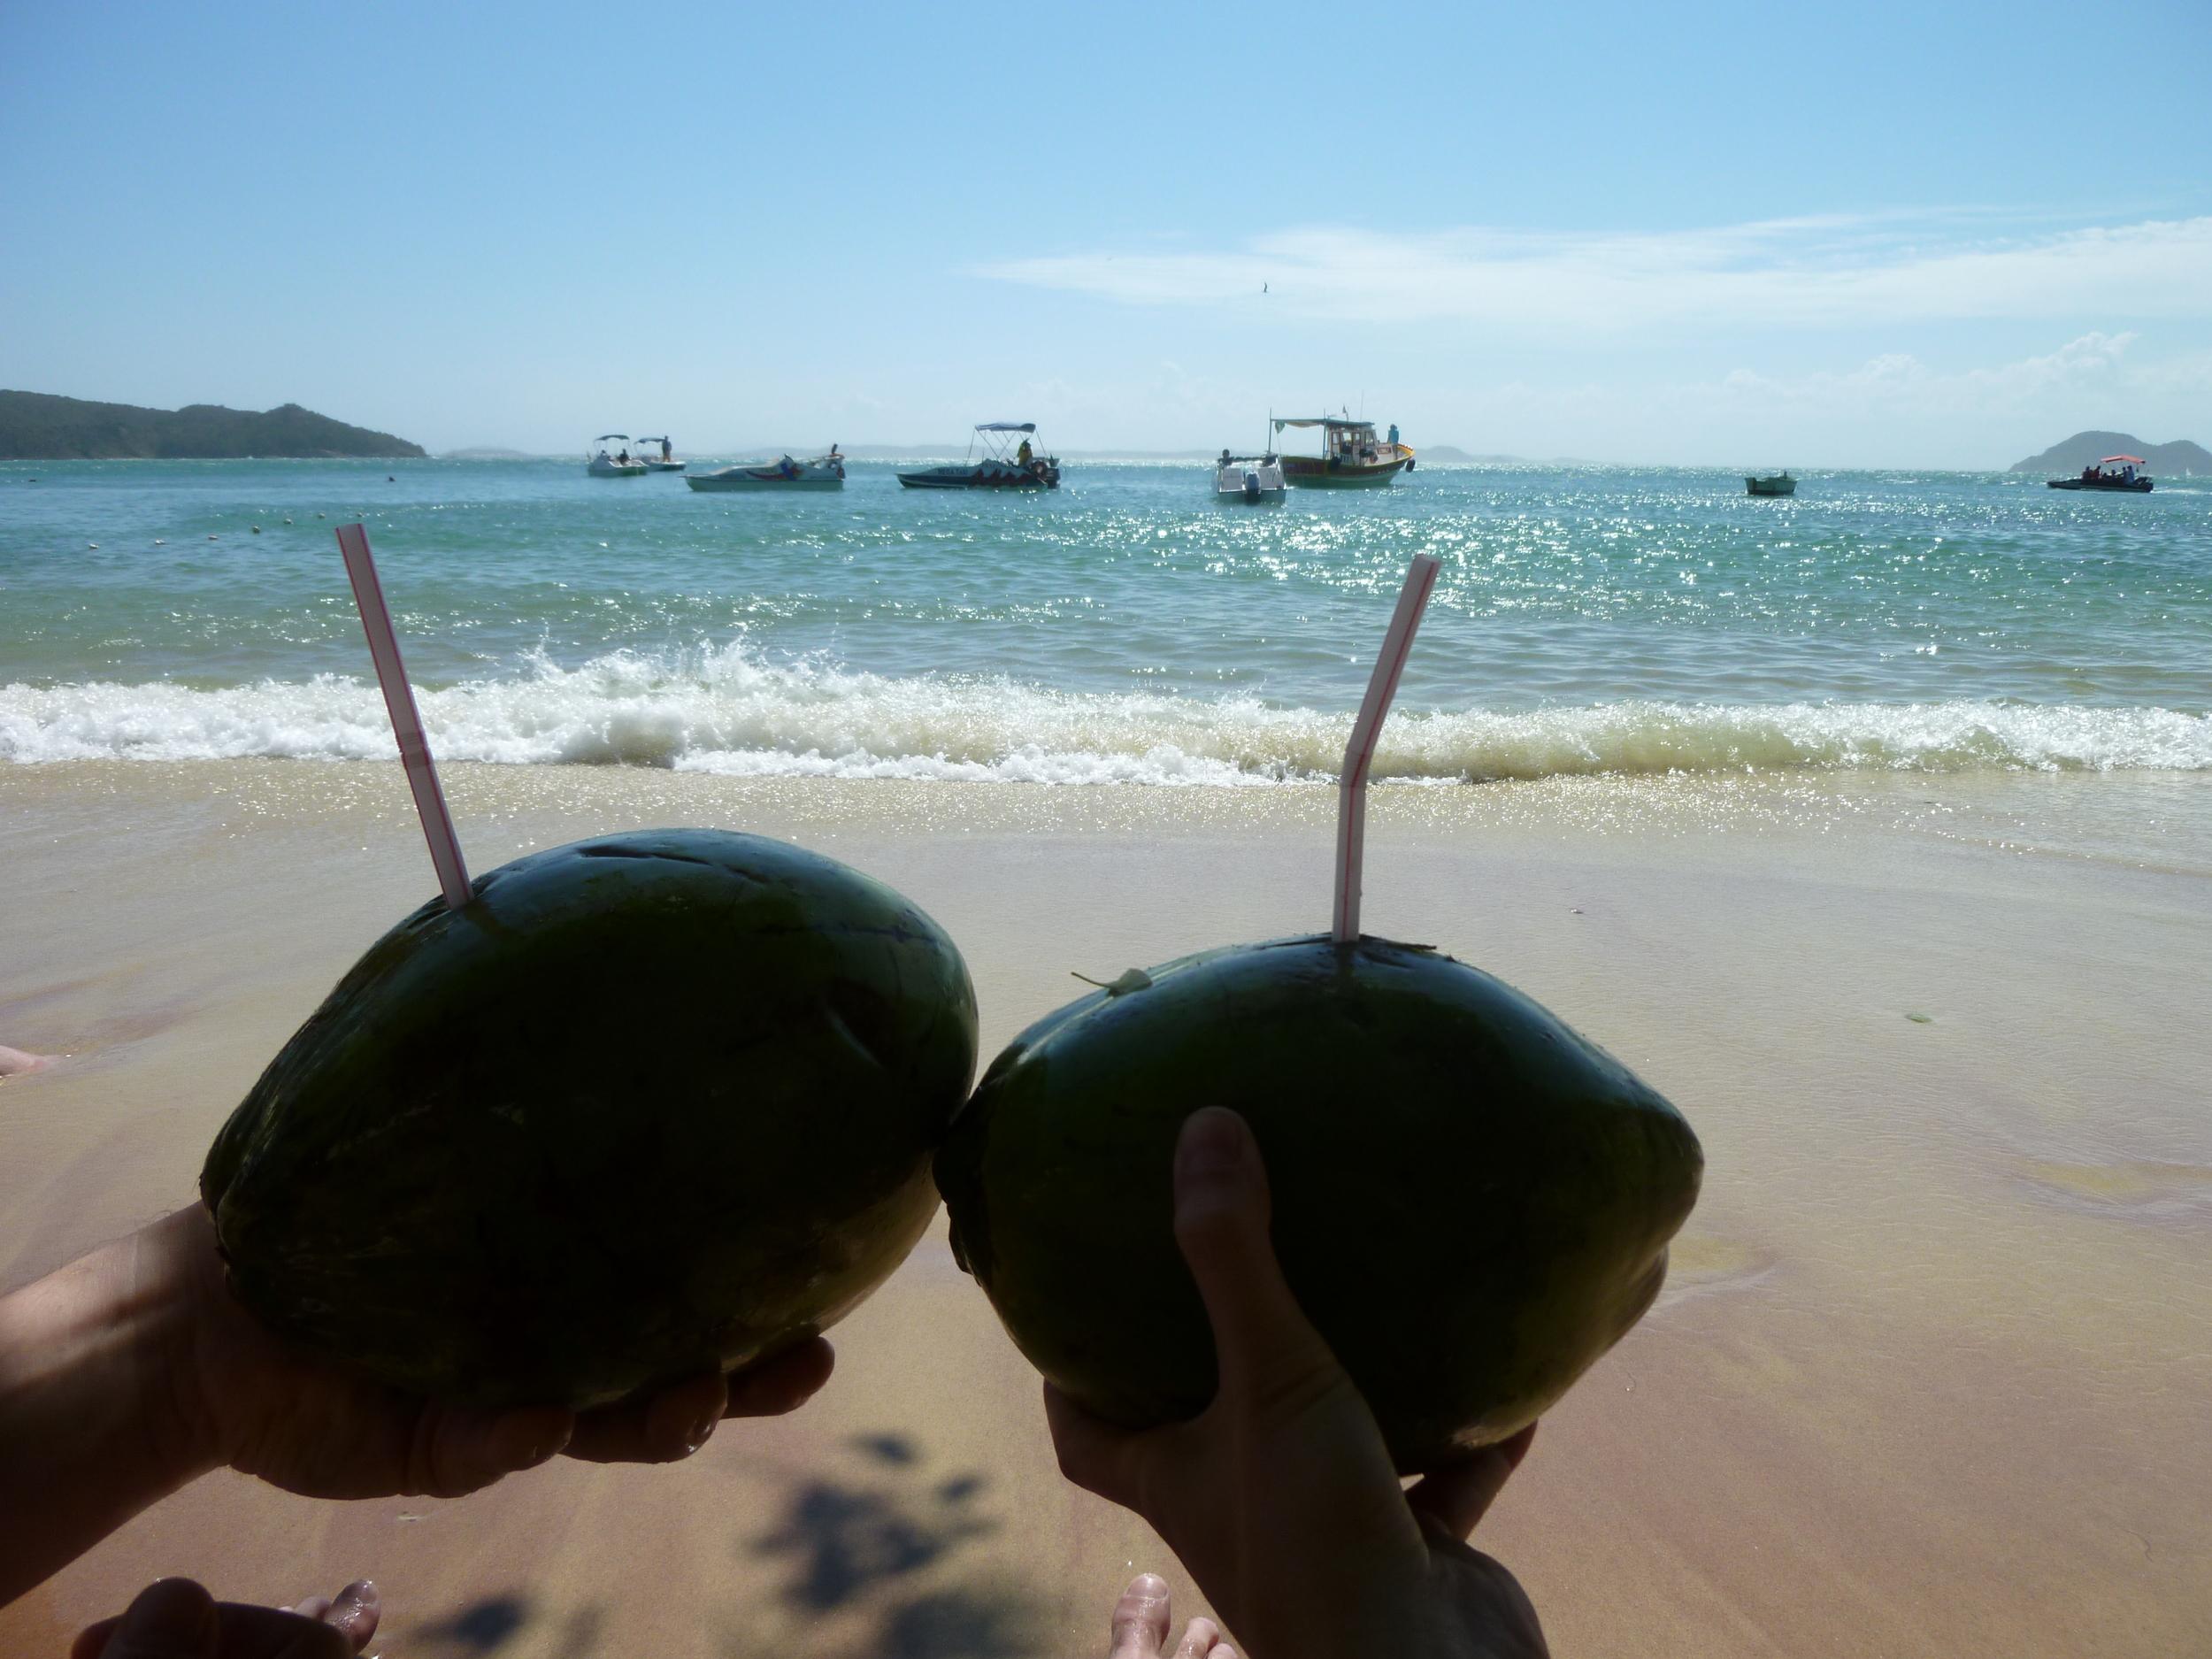 Coco gelado with a straw